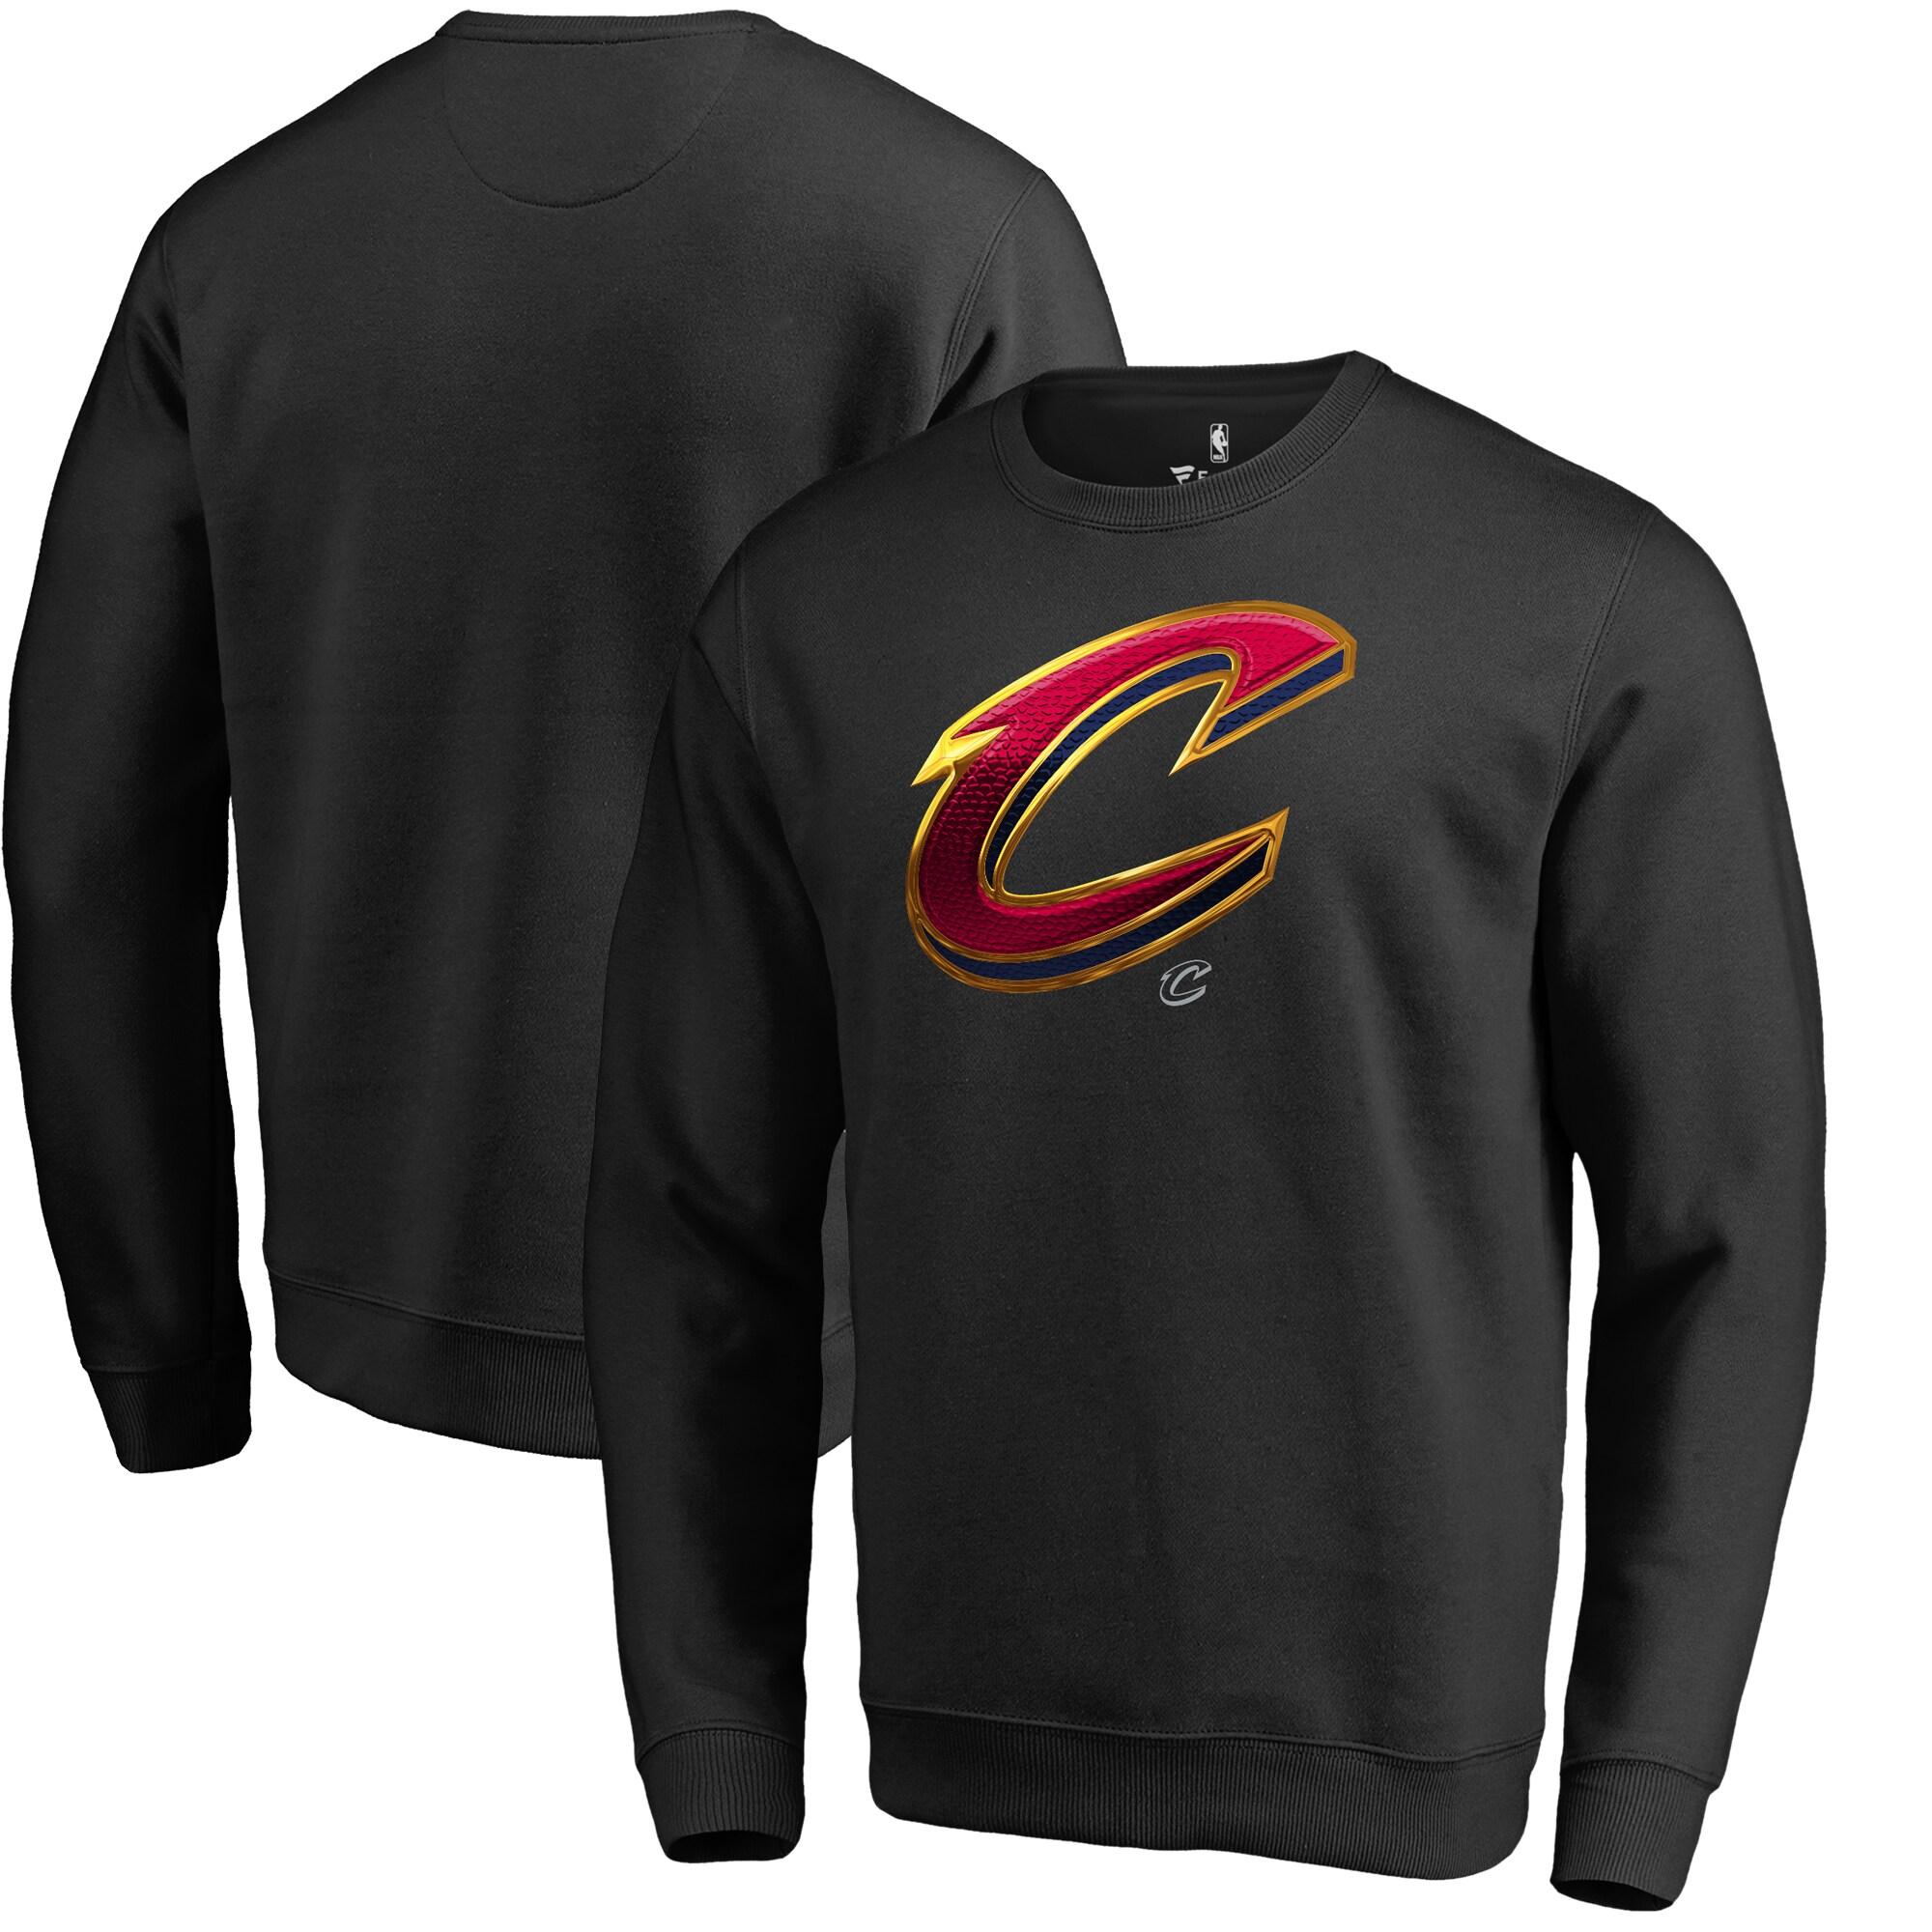 Cleveland Cavaliers Fanatics Branded Midnight Mascot Pullover Sweatshirt - Black